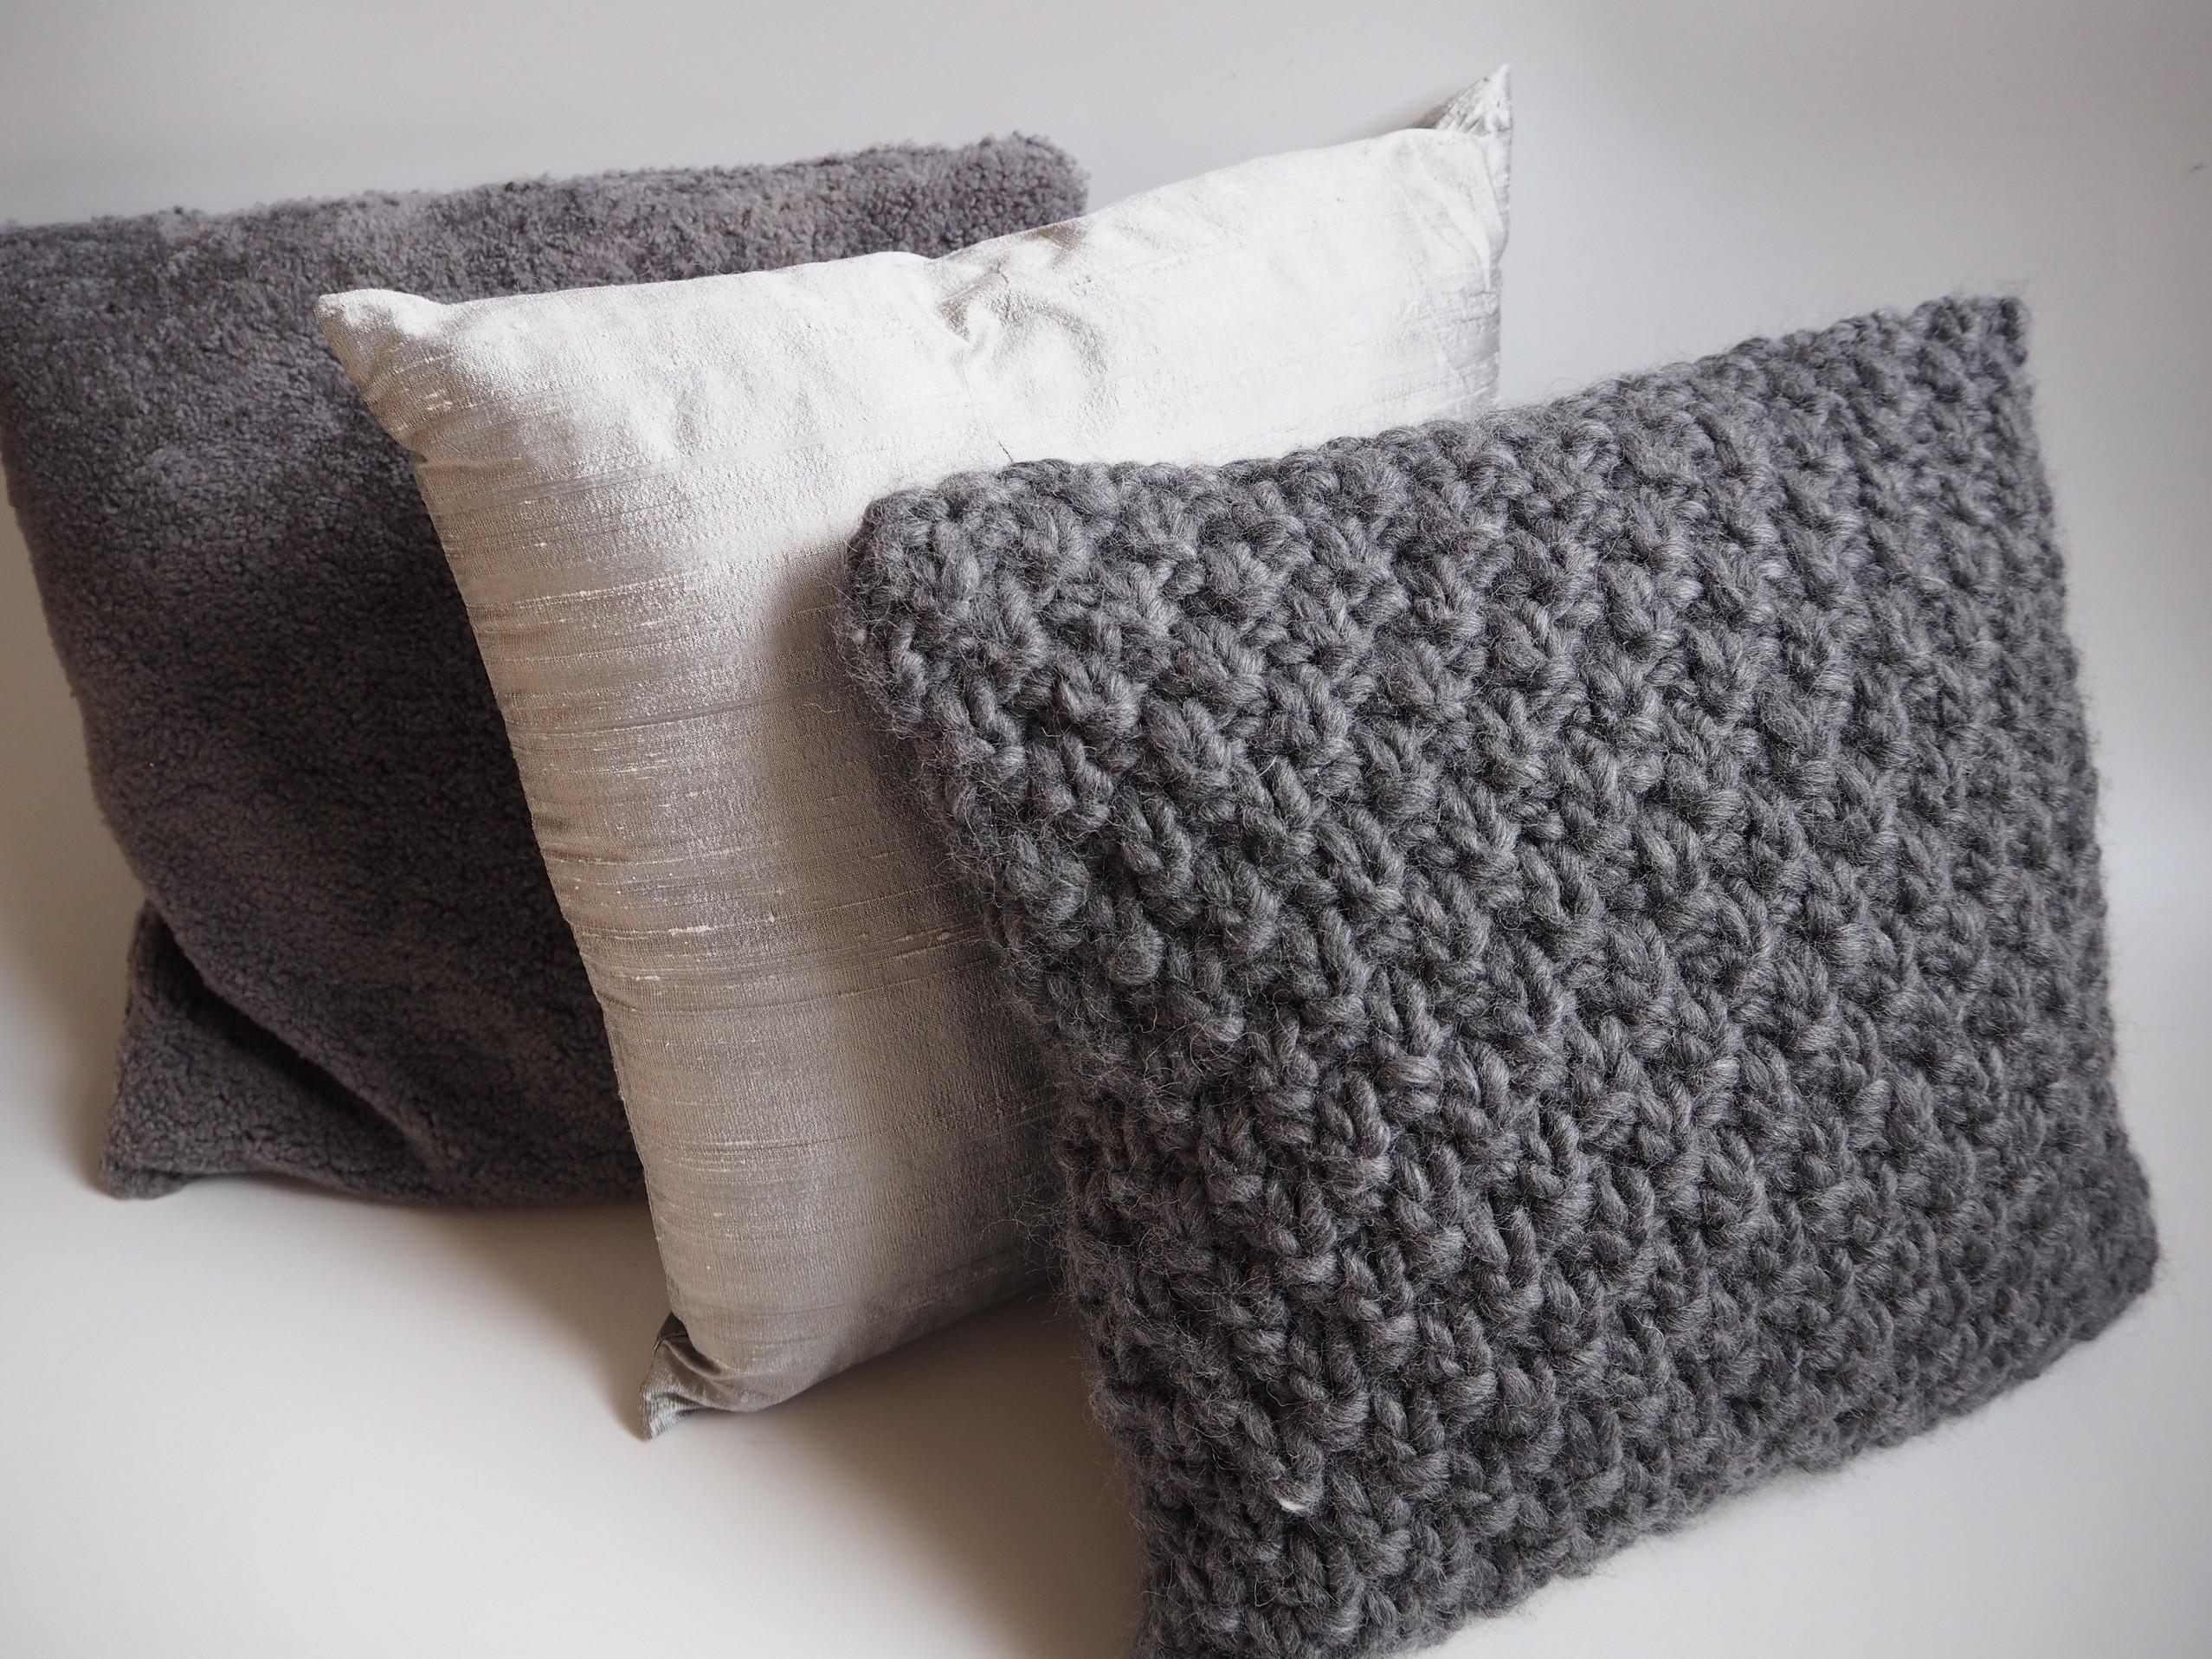 pinqe grobstrick kissen super big 40x40 cm handgestrickt aus 100 schurwolle big pearl in. Black Bedroom Furniture Sets. Home Design Ideas